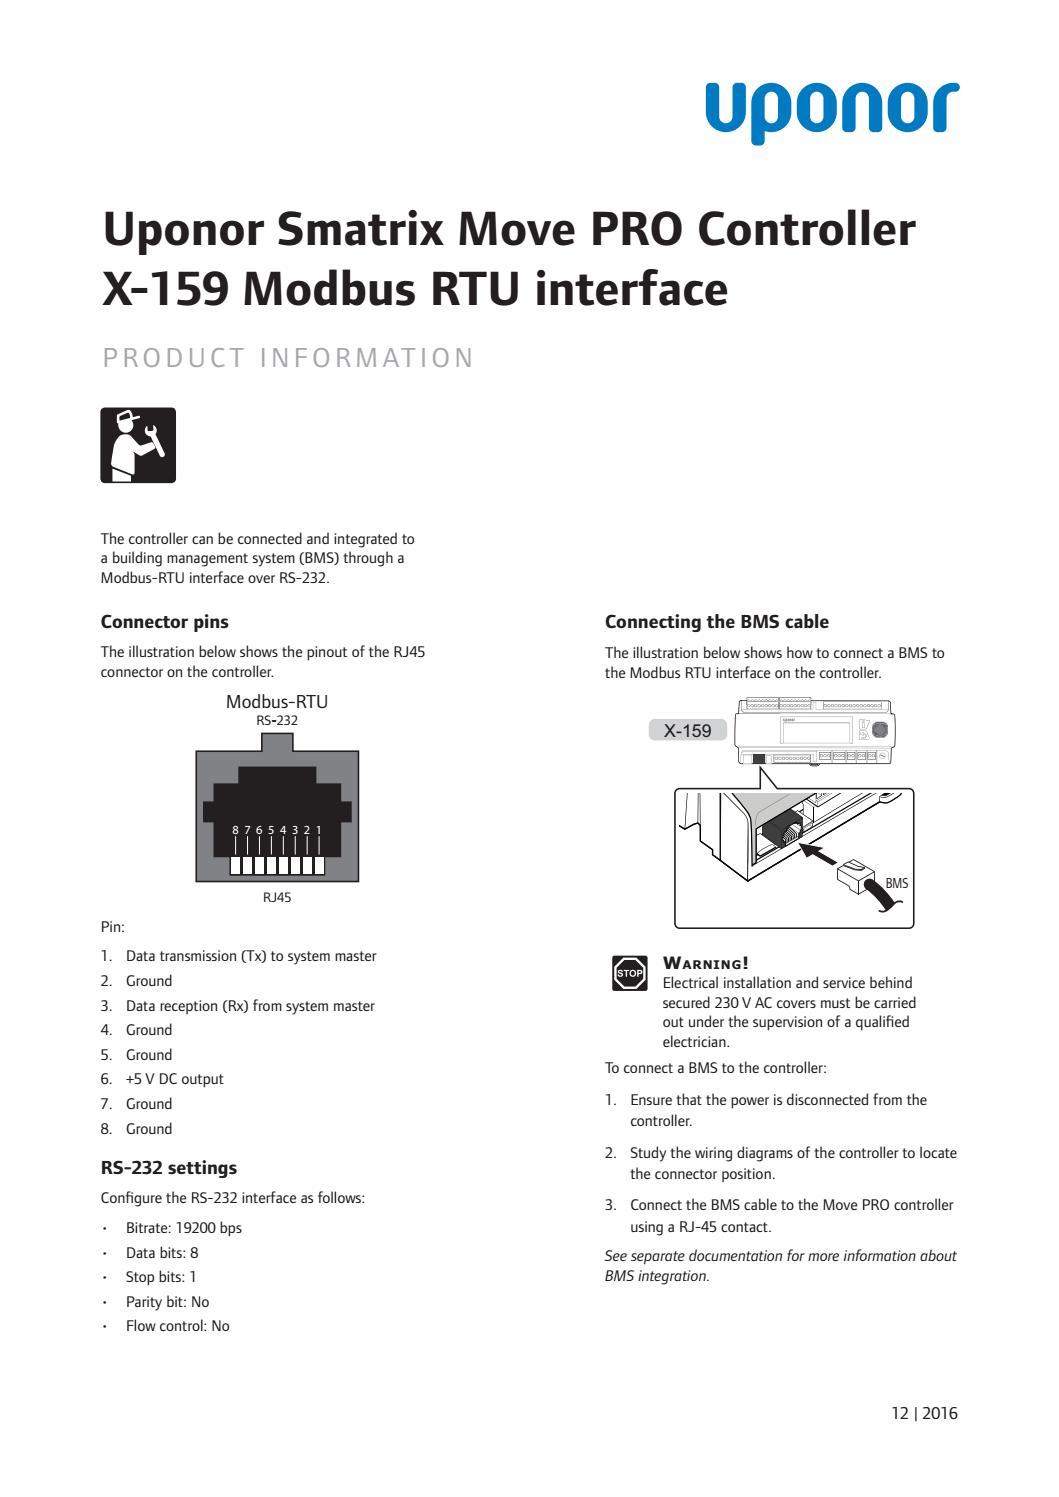 hight resolution of uponor product info smatrix move pro modbus rtu en 1088472 12 2016